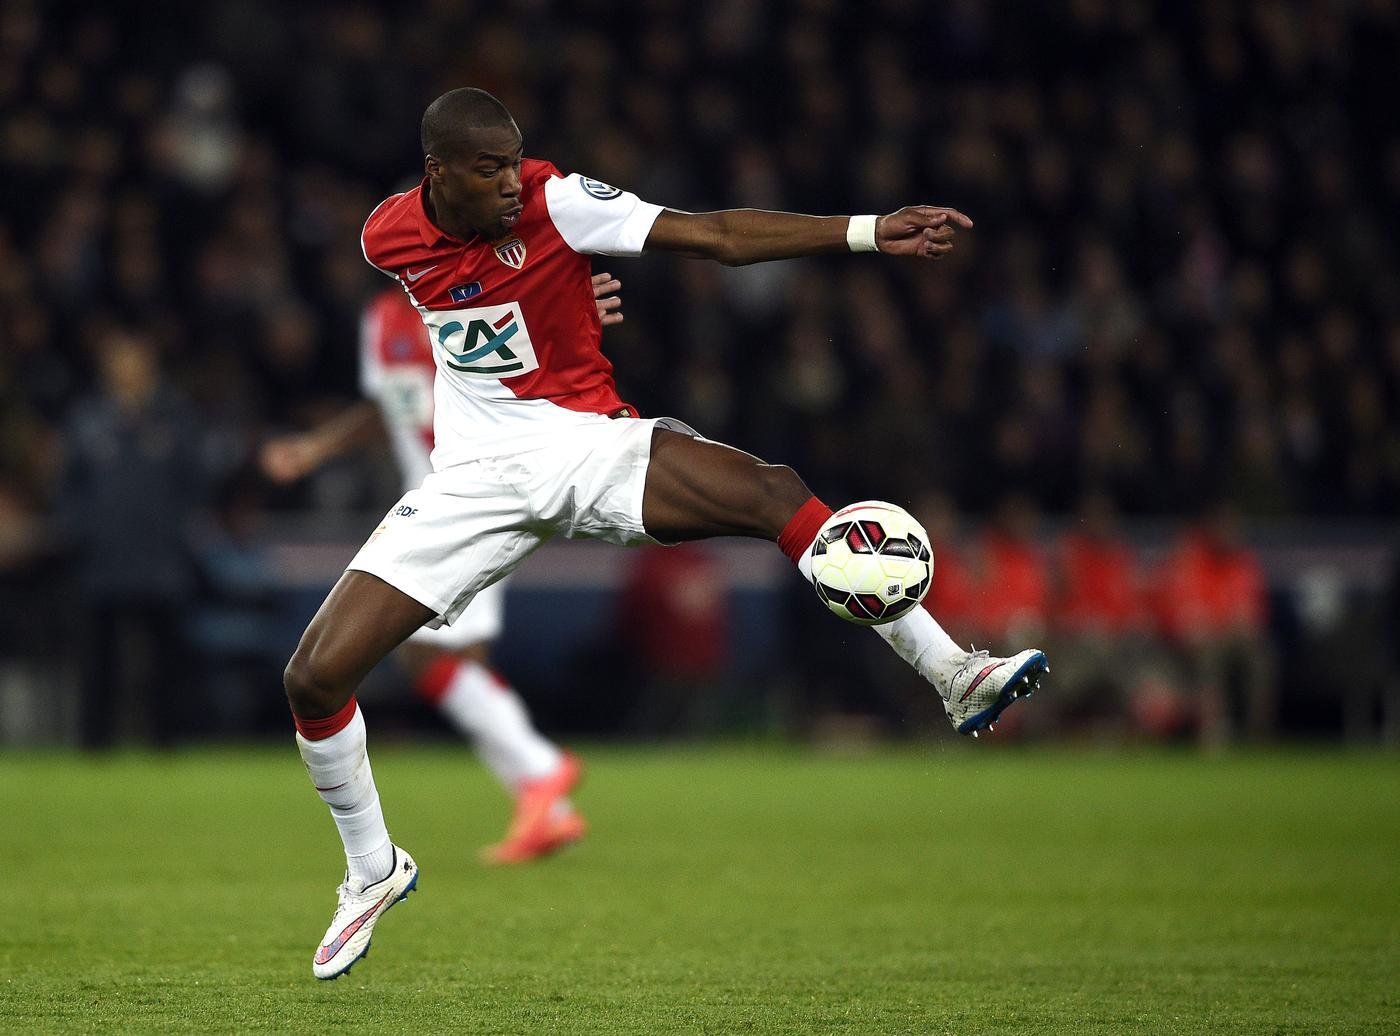 Mystery Premier League club 'bids £25.3million for Arsenal transfer target Geoffrey Kondogbia'